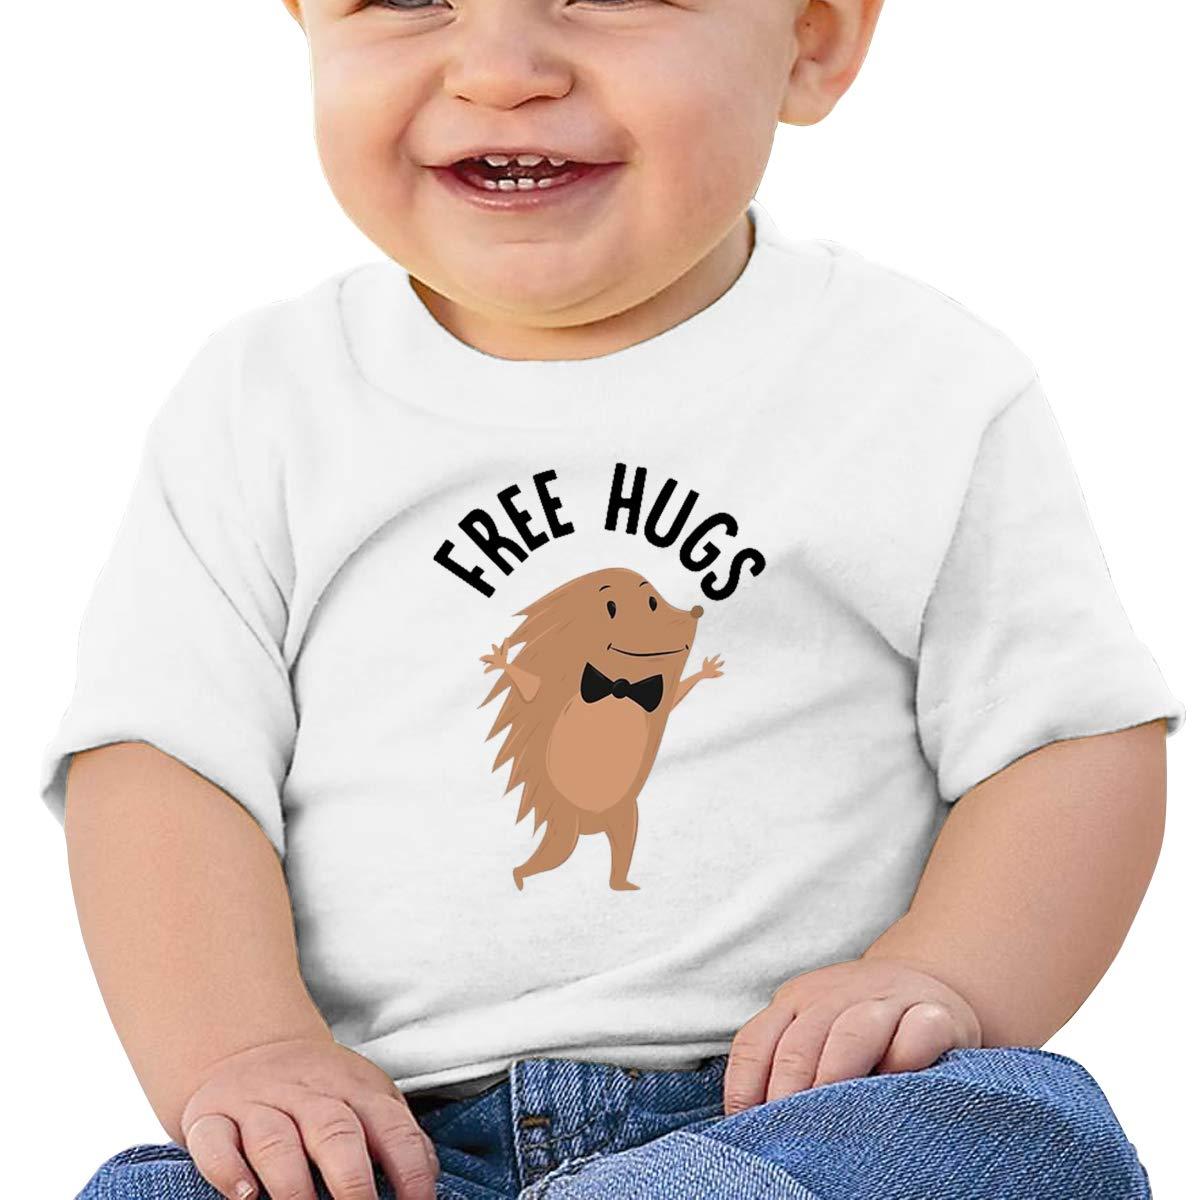 AiguanFree Hugs Toddler//Infant Short Sleeve Cotton T Shirts White